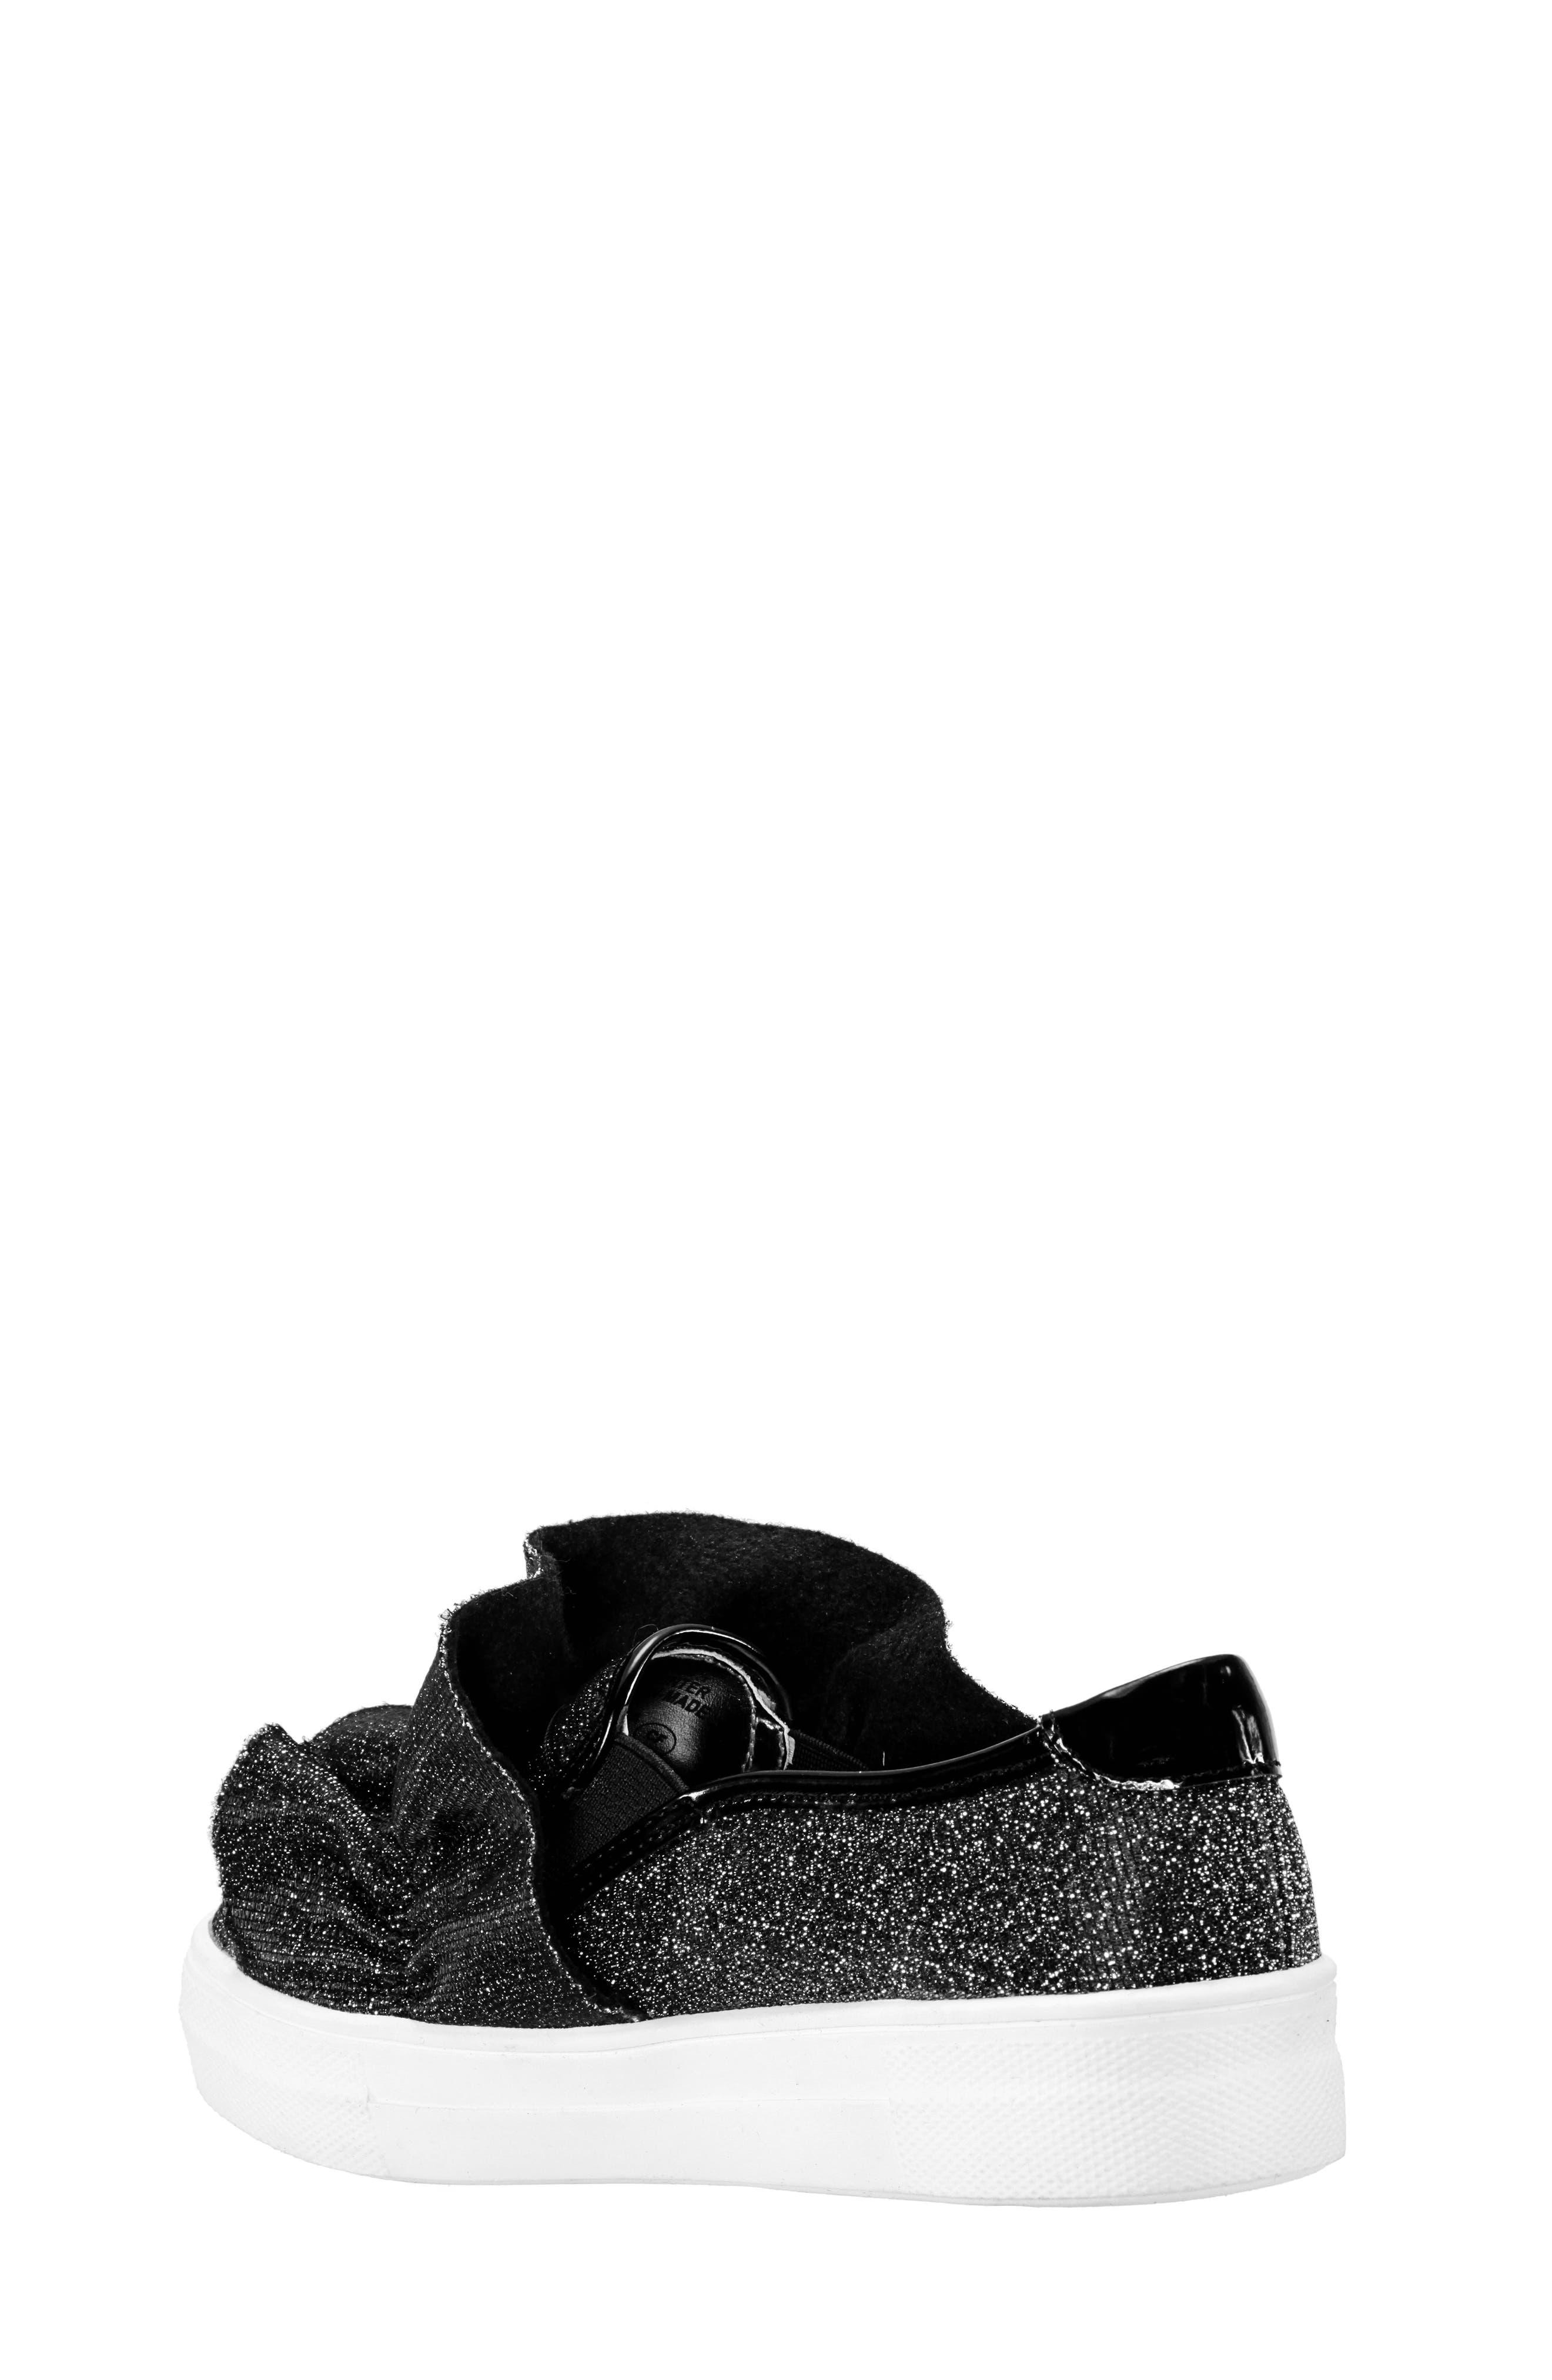 Ivani Slip-On Sneaker,                             Alternate thumbnail 2, color,                             BLACK SPARKLE FABRIC